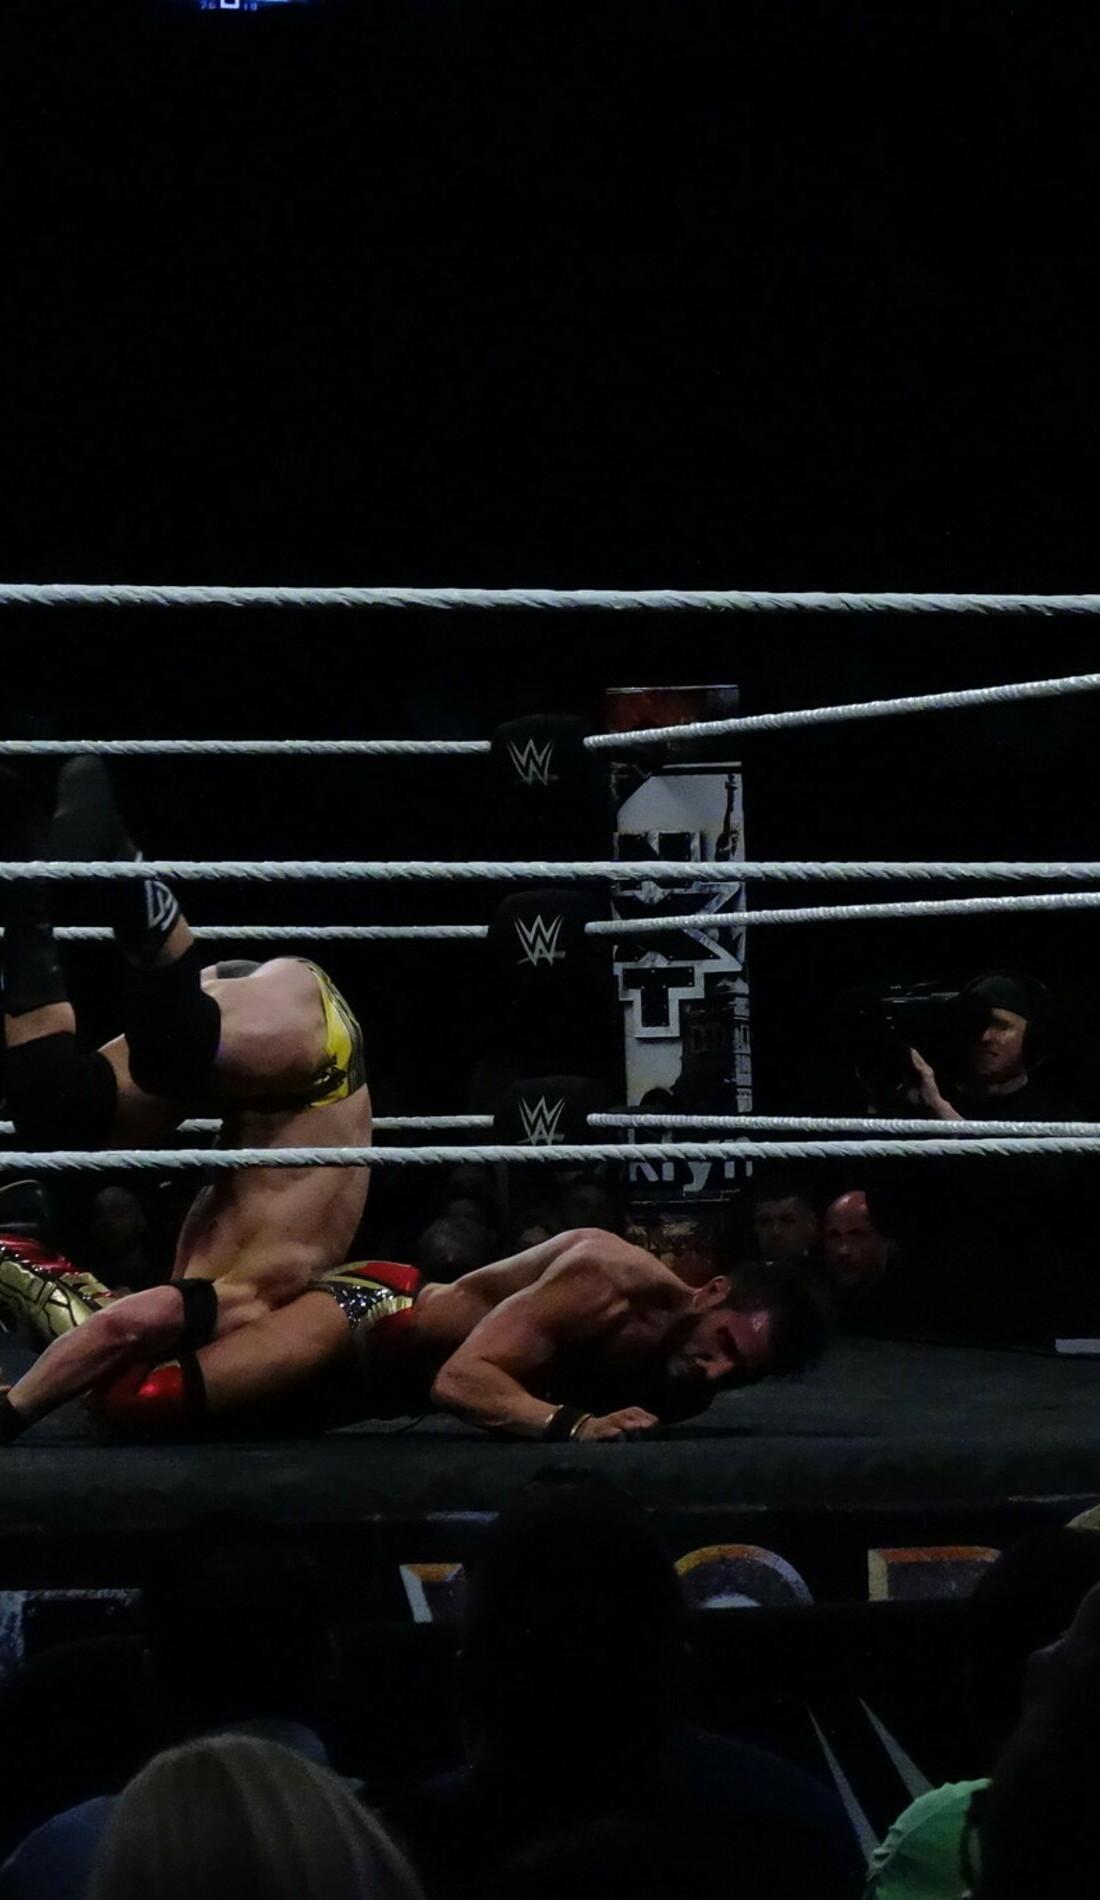 A Extreme Midget Wrestling live event